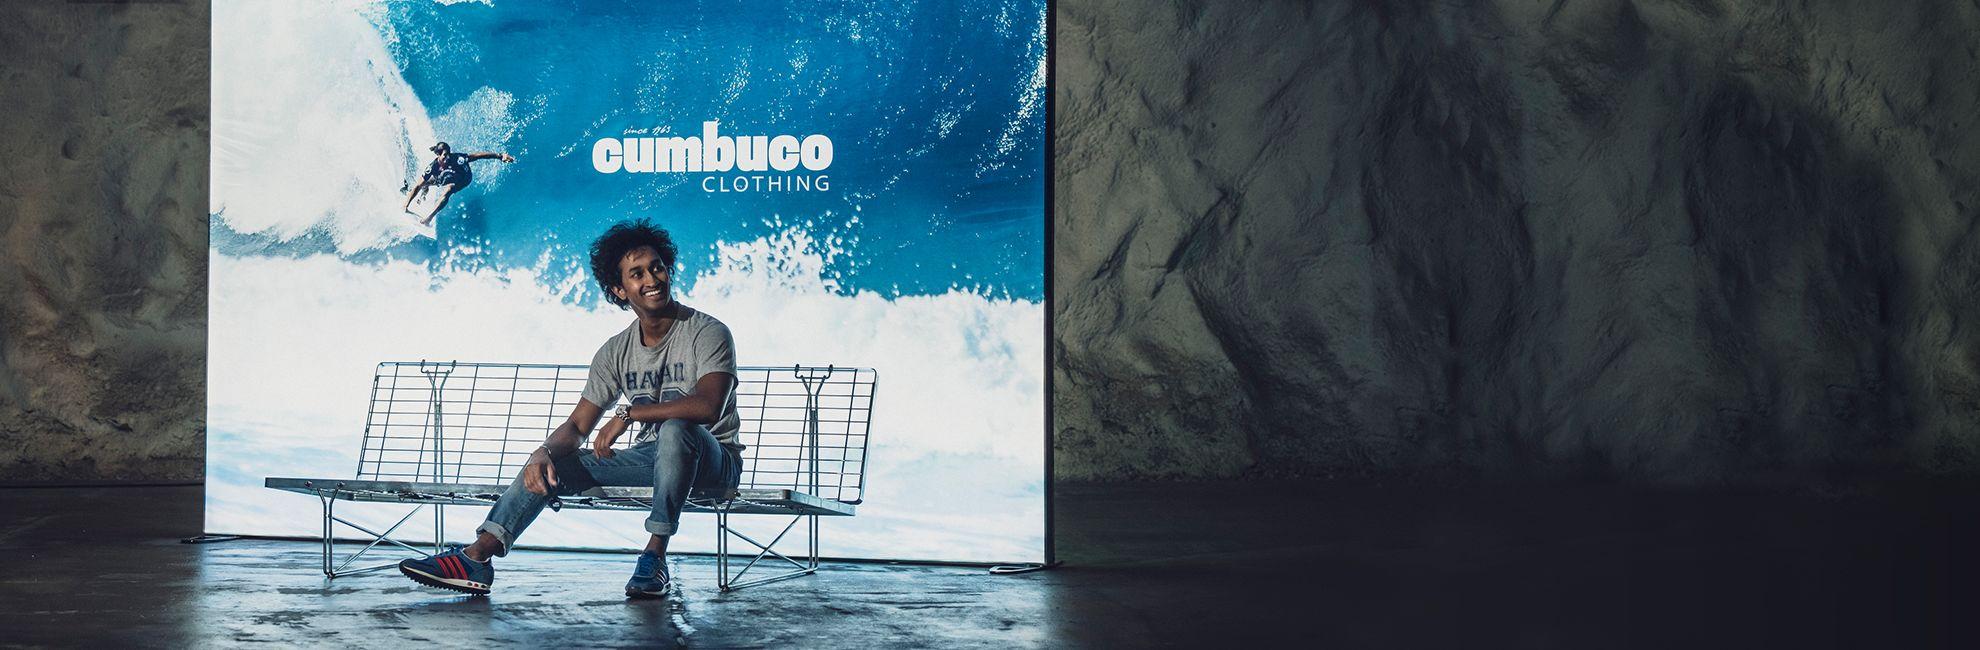 Expand-grandfabric-lightbox-cumbuco-clothing-hero-v3-2020